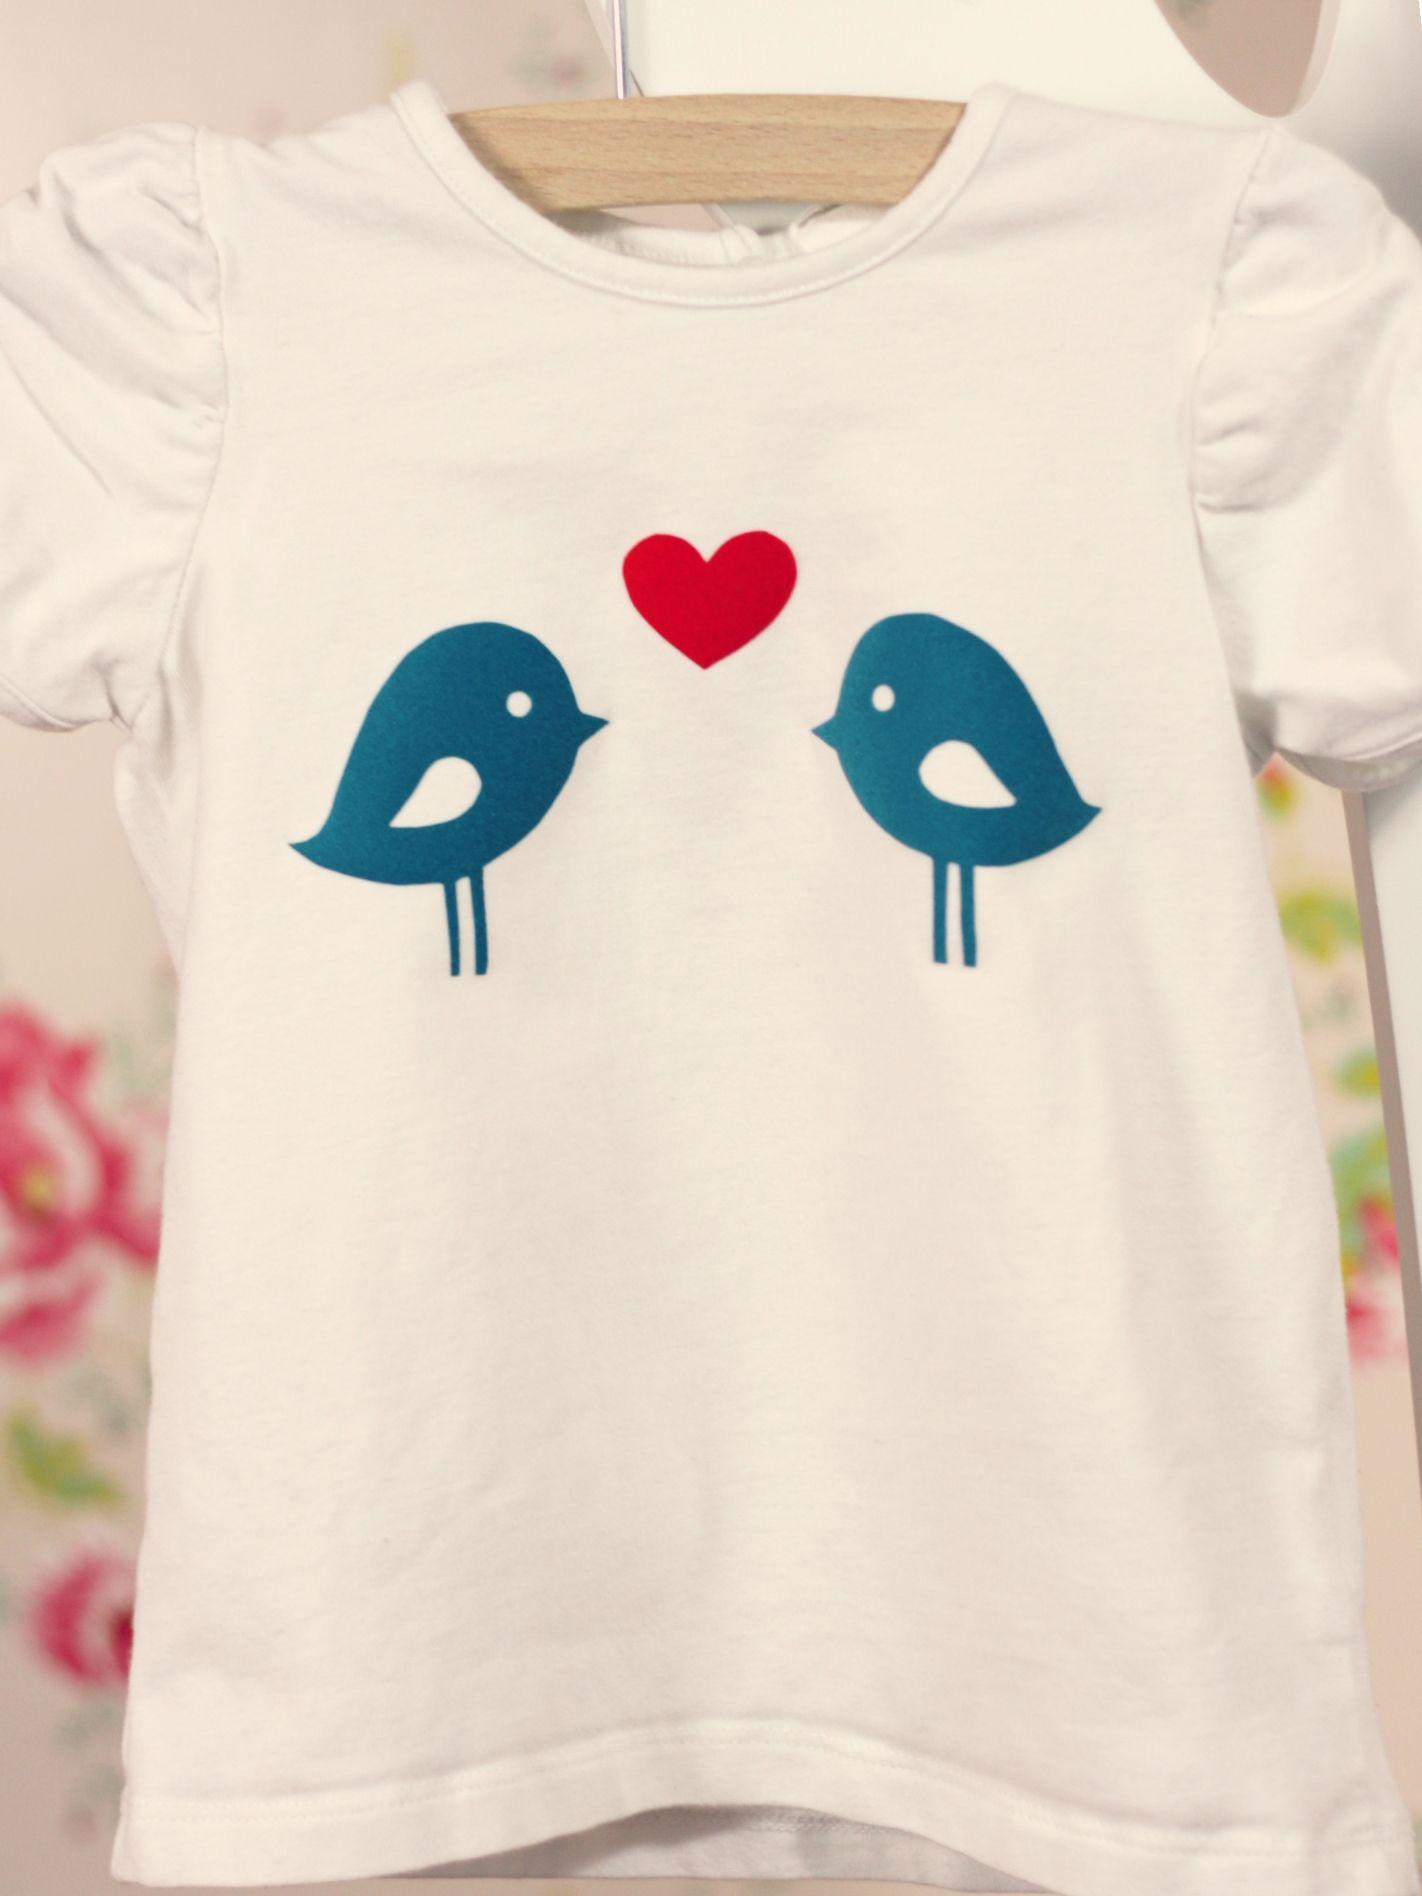 DIY - flock - little girl t-shirt | Flock | Pinterest - Ropa, Niños ...